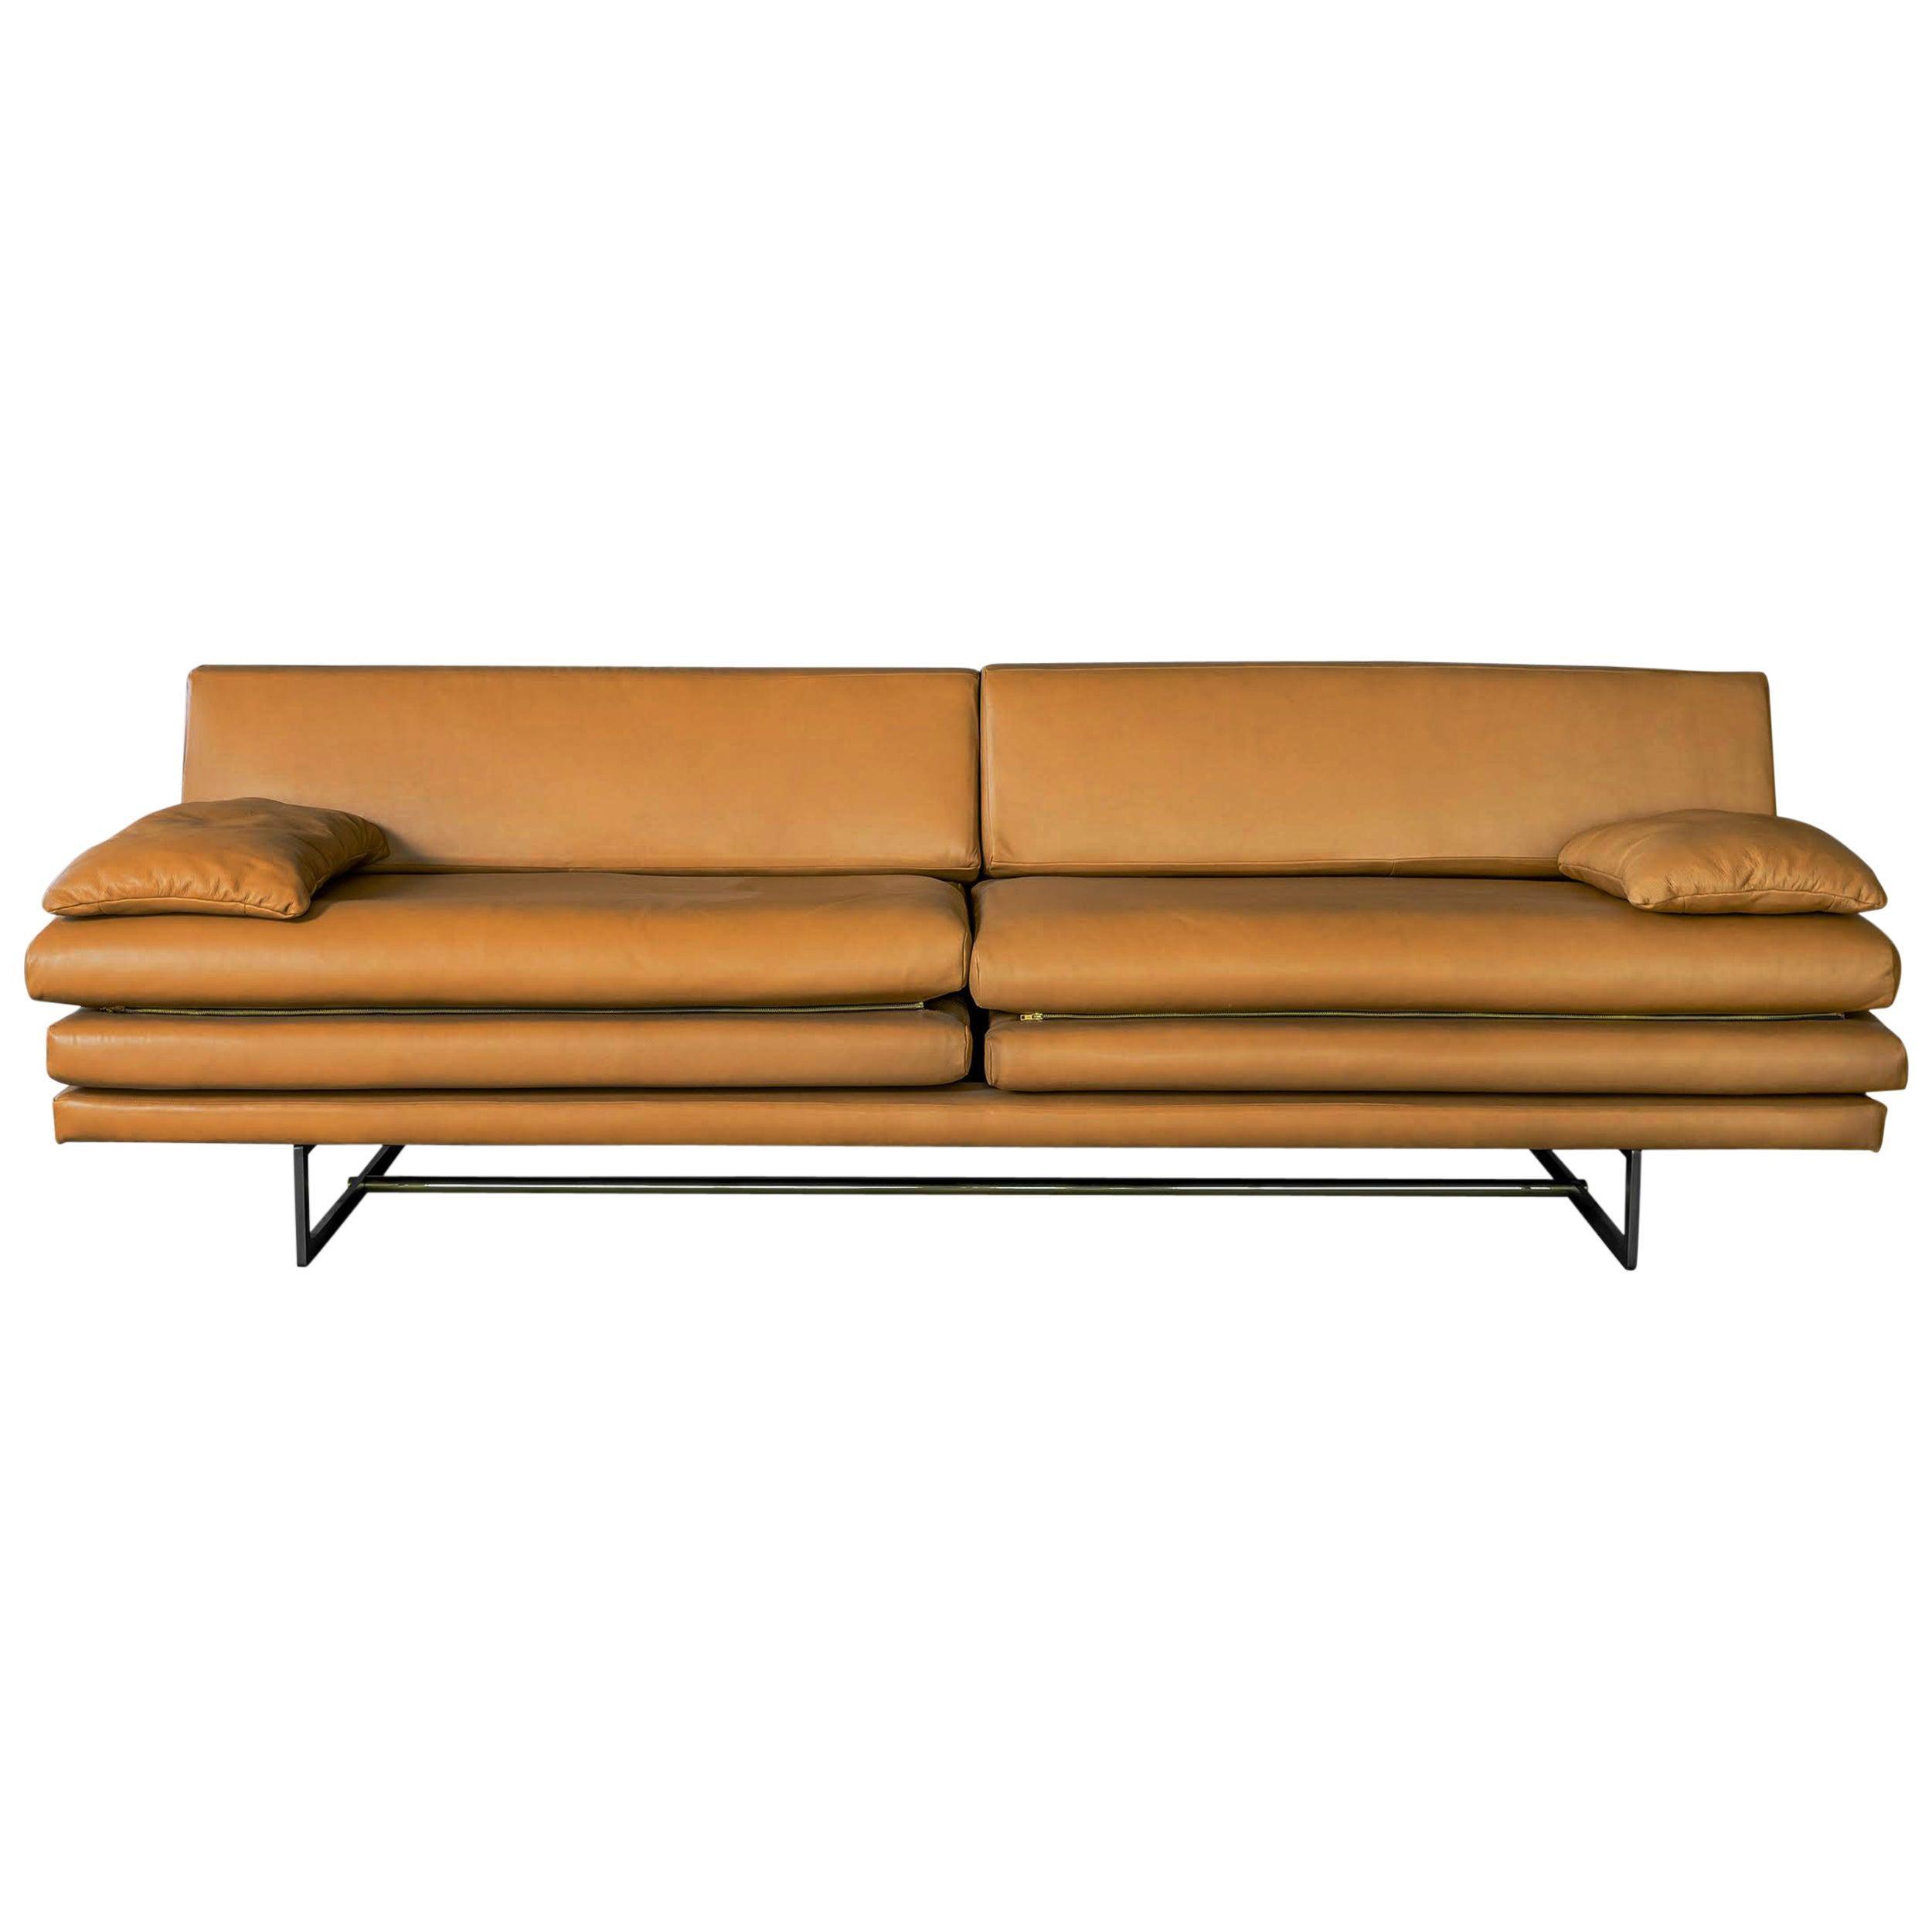 Milan Orange Leather Sofa by ATRA